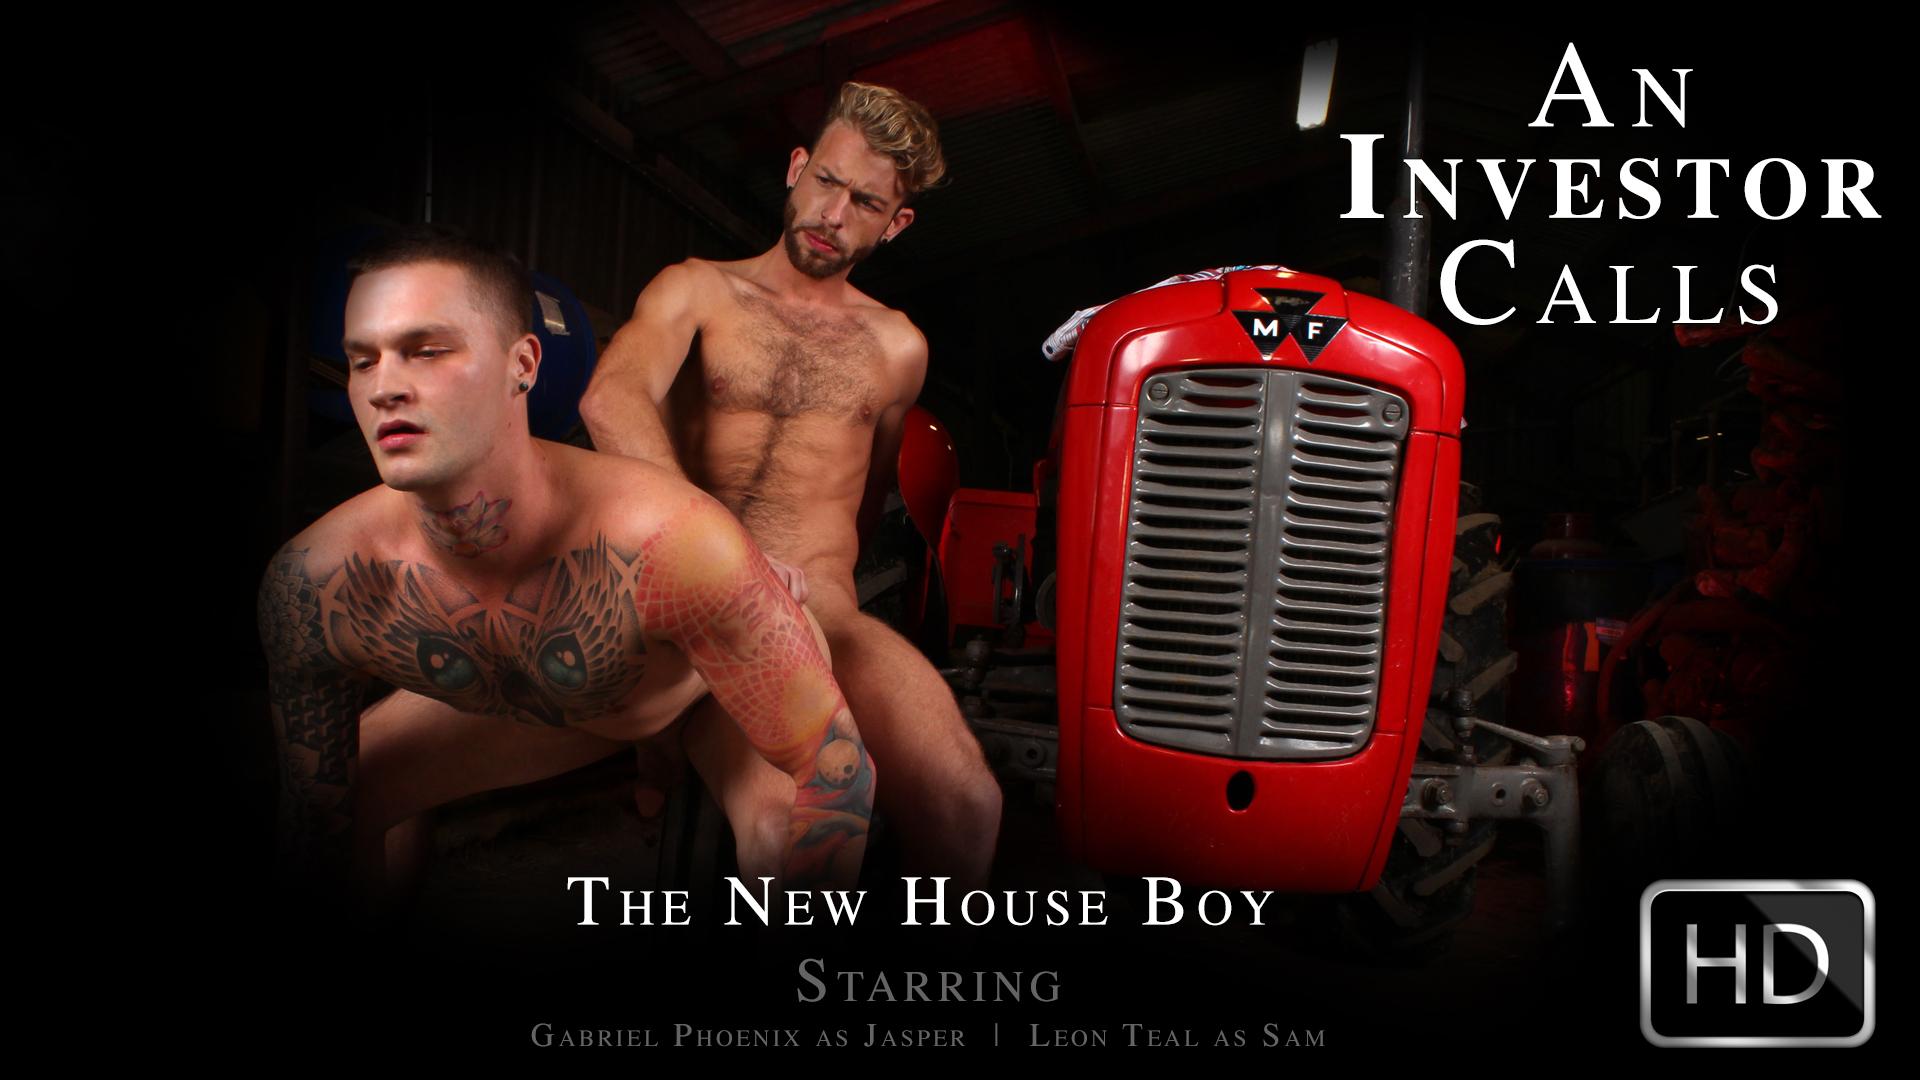 An Inspector Calls - Scene 1, The New House Boy - UKHotJocks sarah chalke nude video